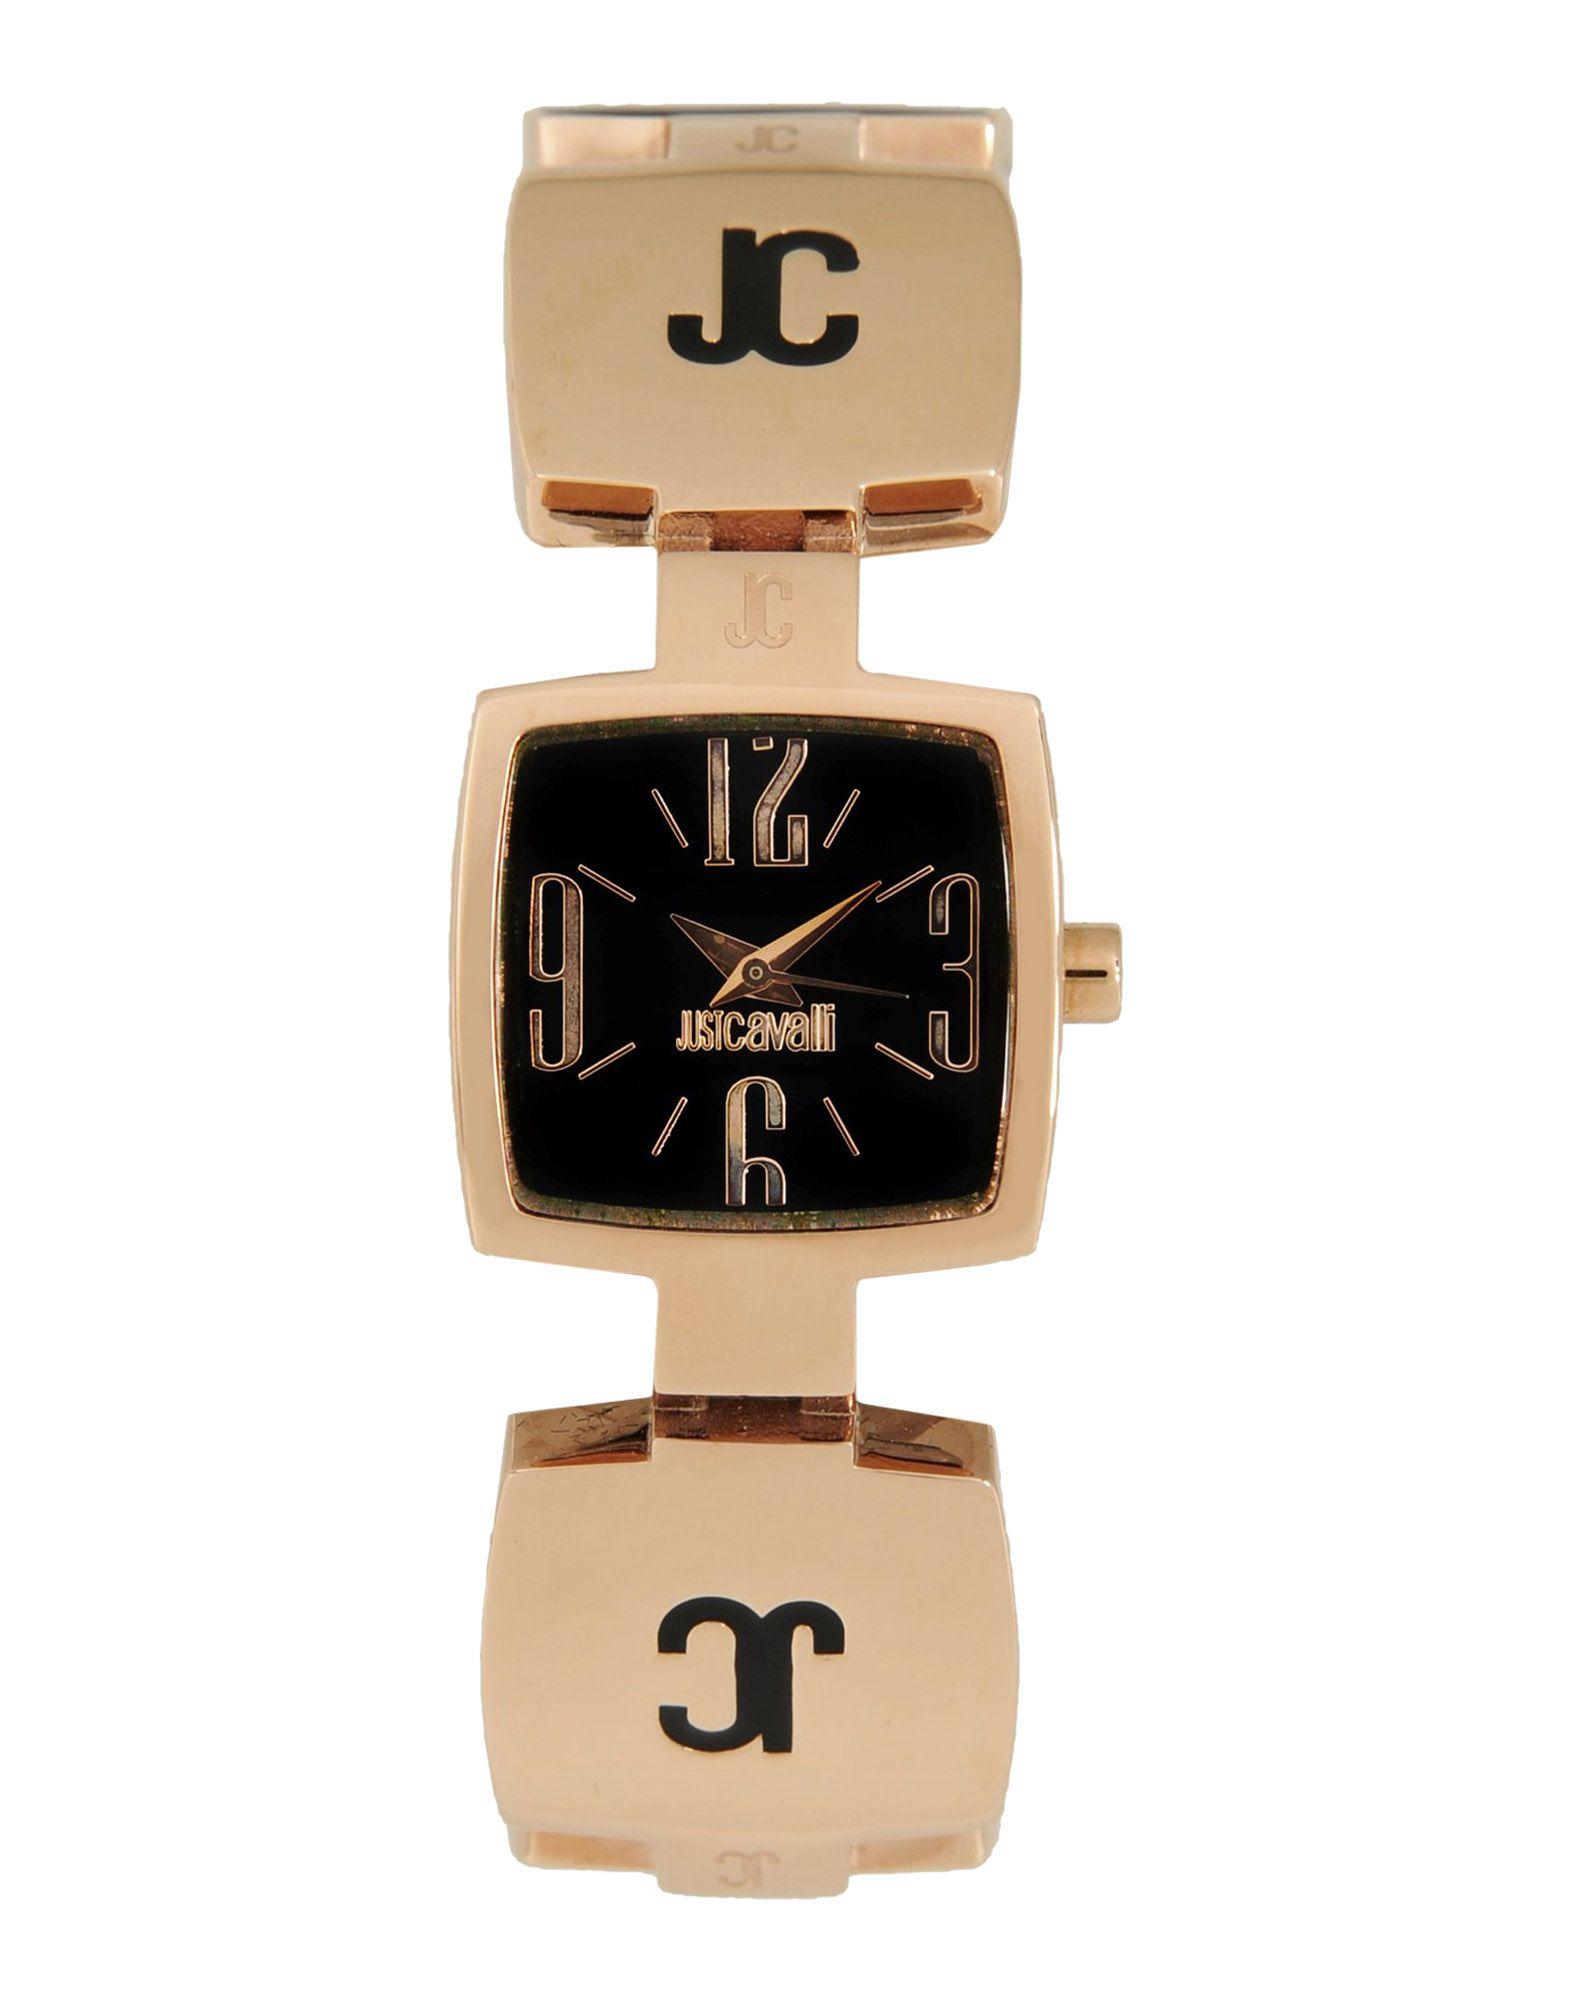 JUST CAVALLI TIME Wrist watches